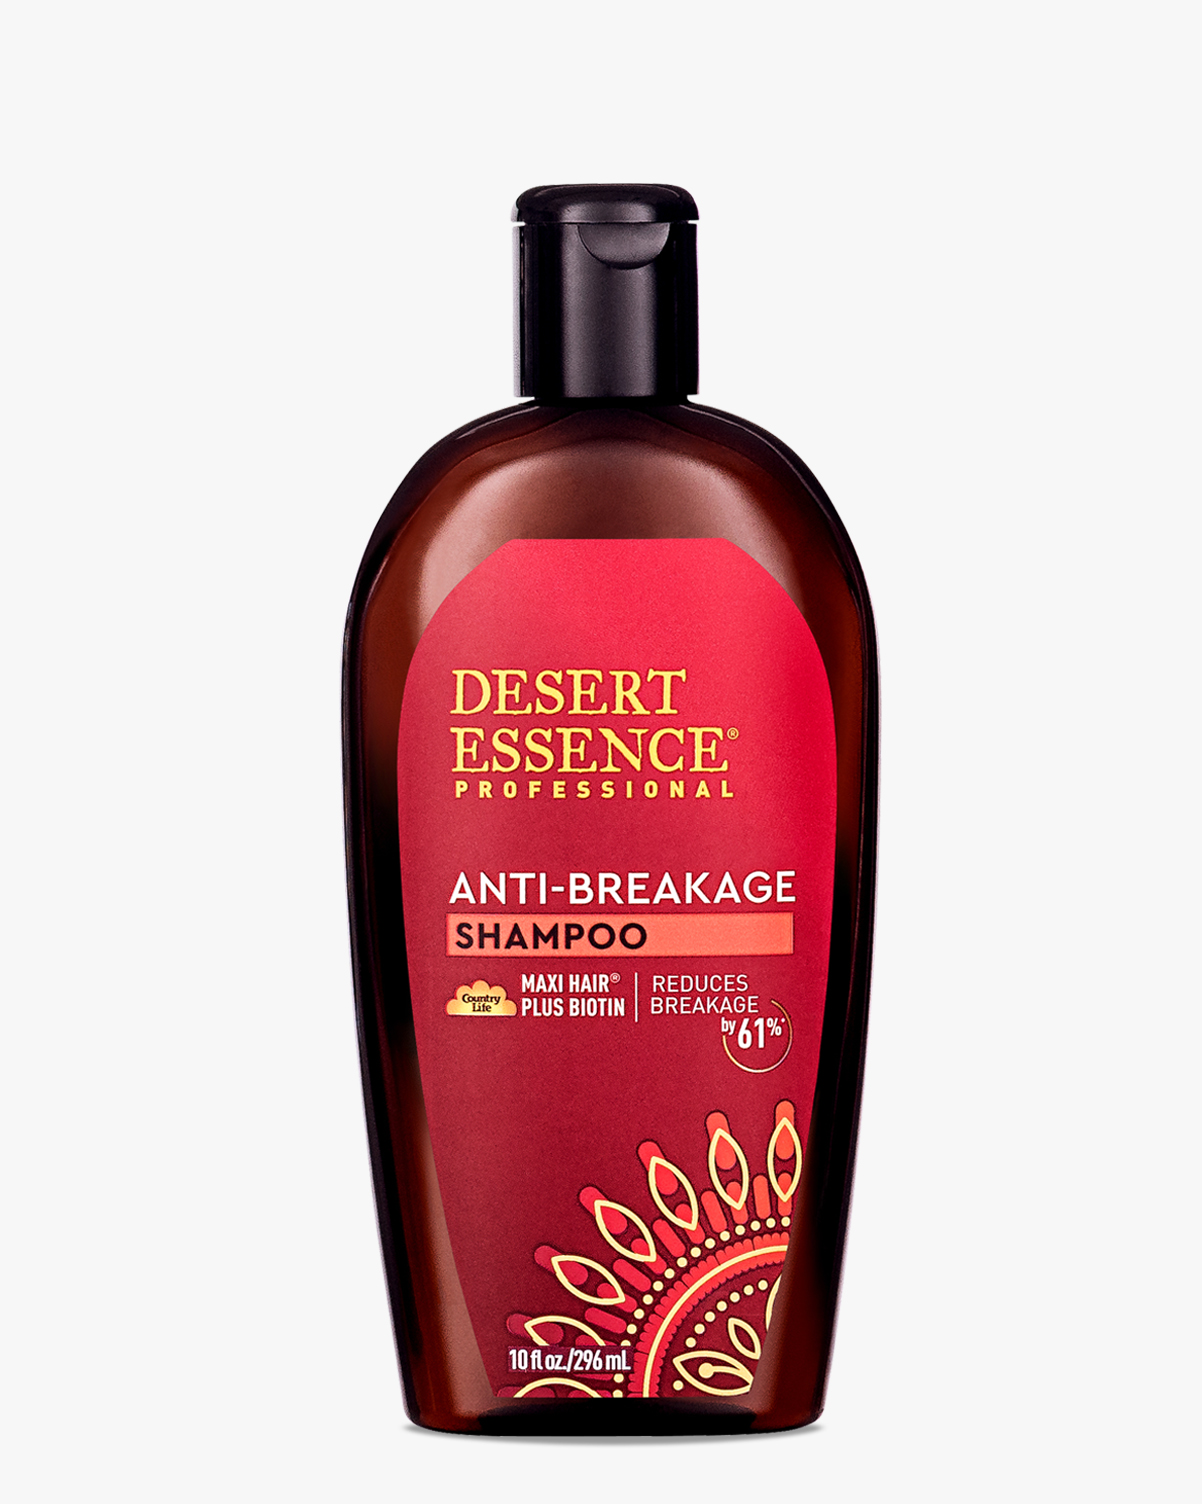 Desert Essence coupon: Desert Essence Anti-Breakage Shampoo, 10 fl. oz. | Gluten-Free